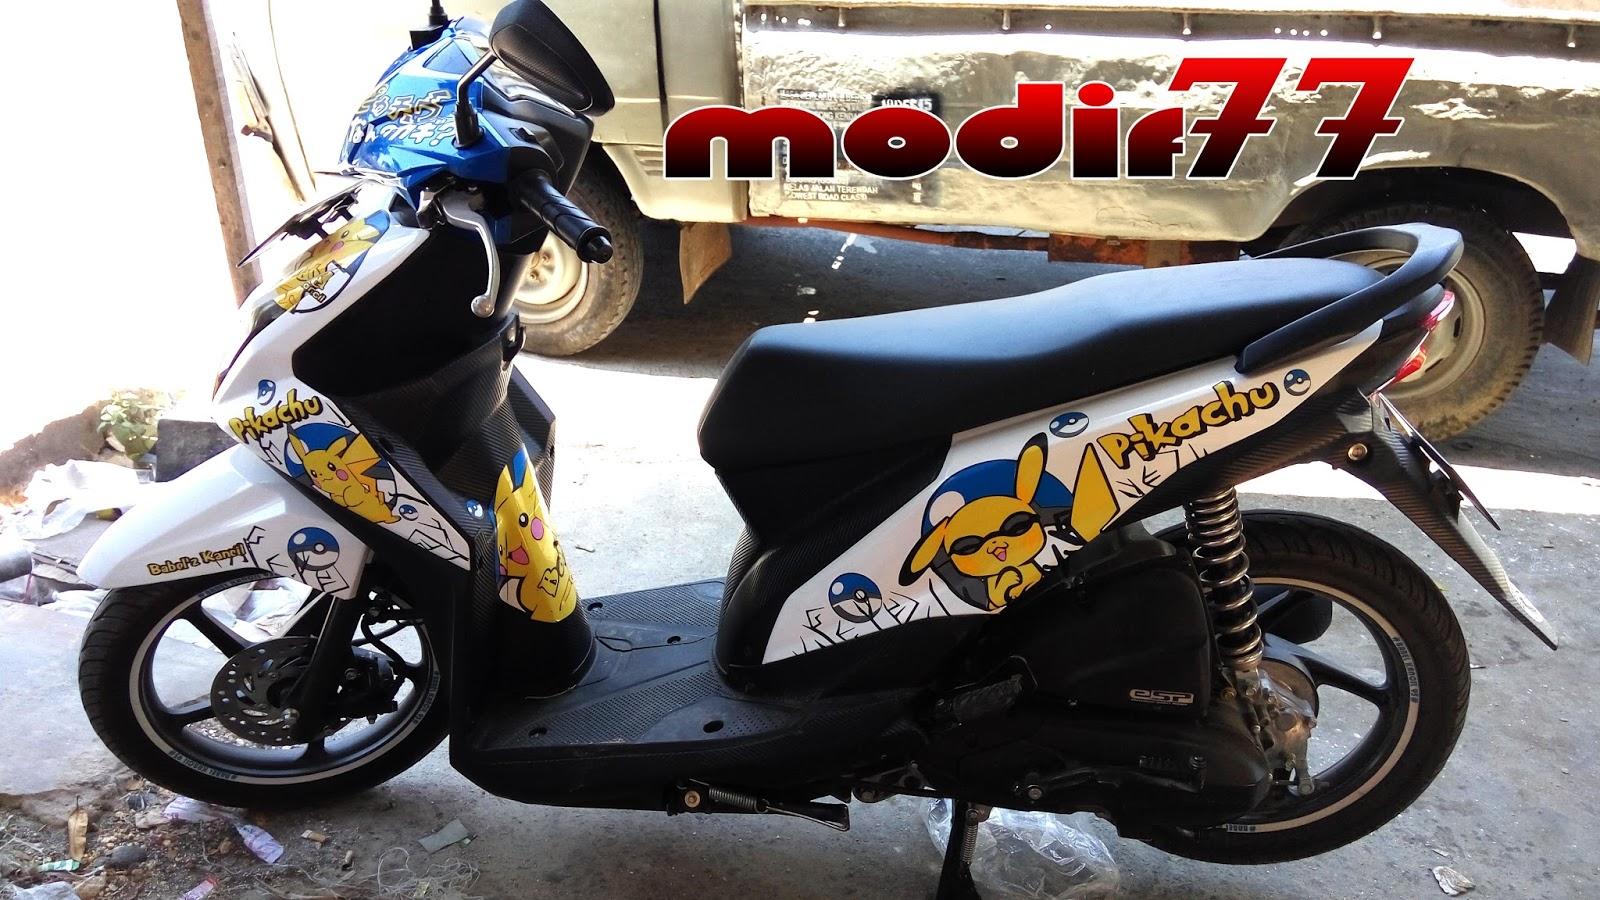 modifikasi honda beat 2015 full pikachu anime biru putih | modif 77